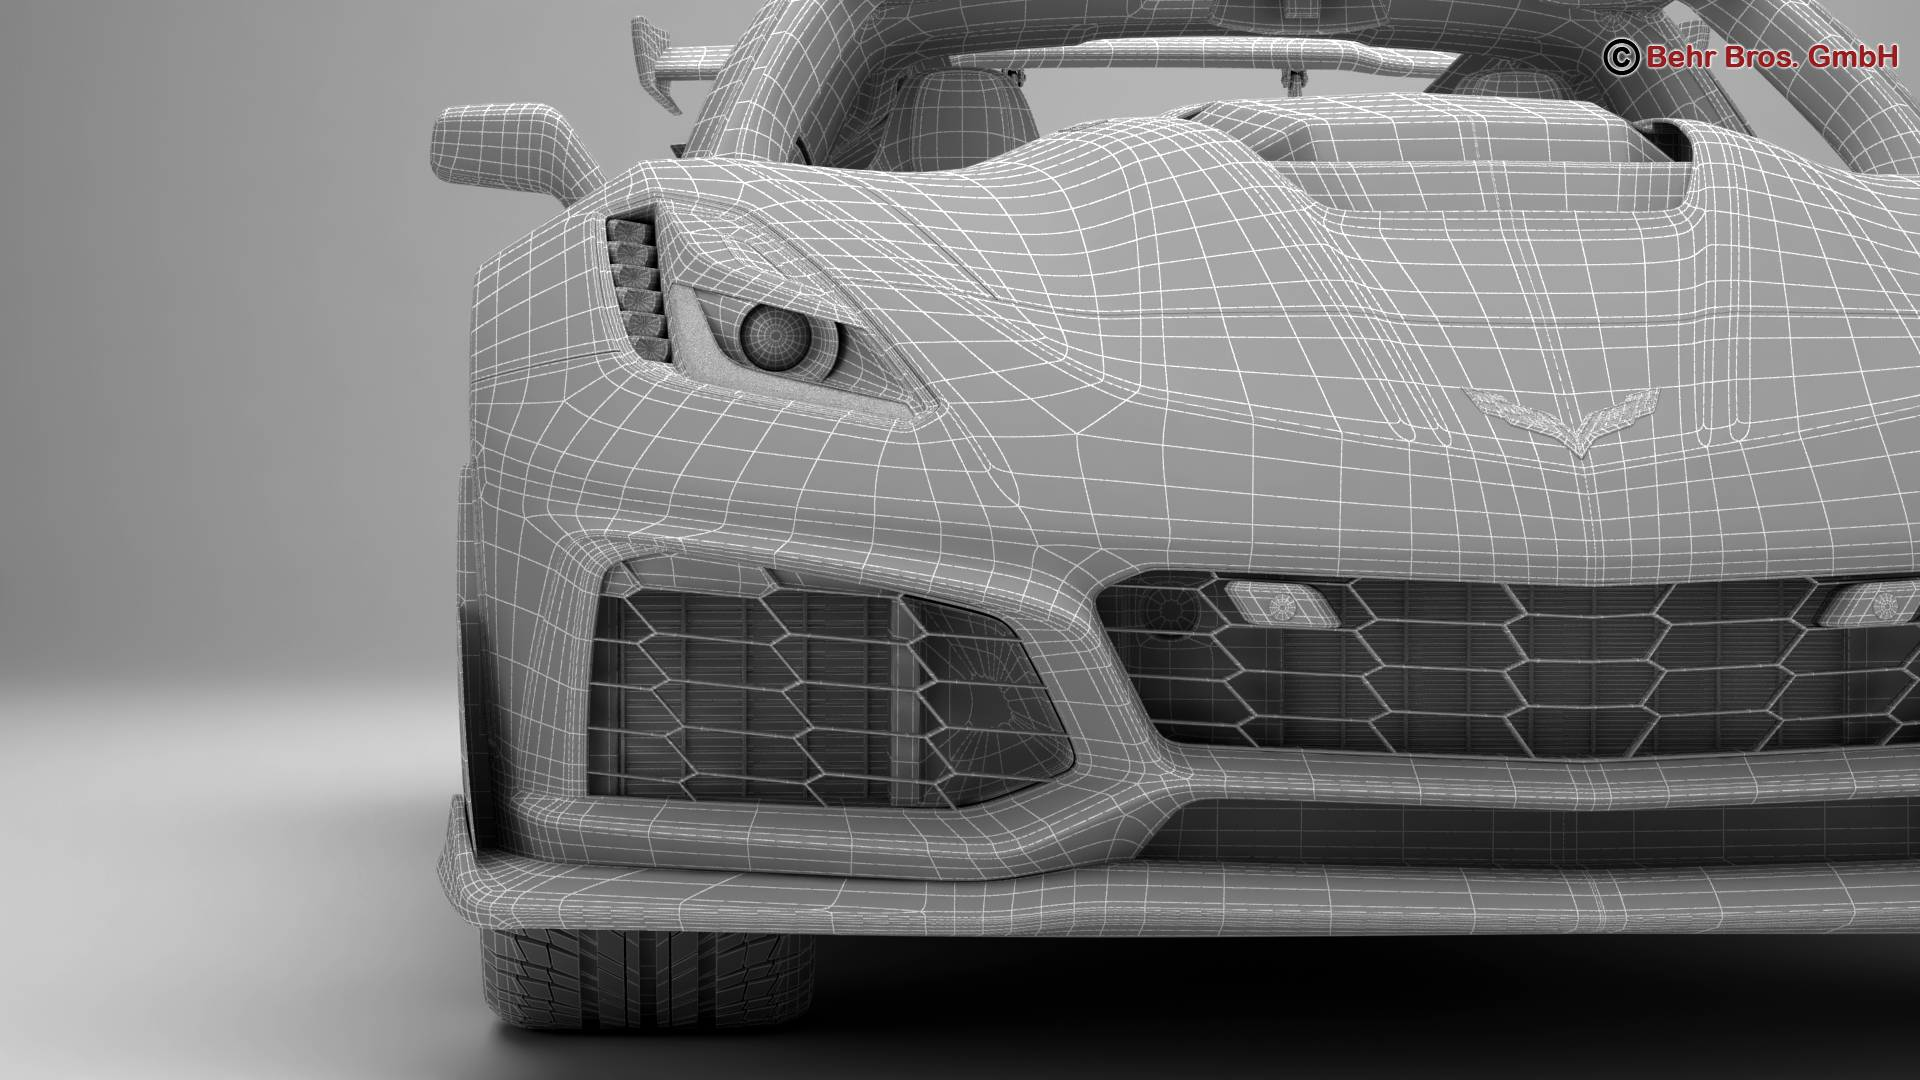 chevrolet corvette zr1 2019 3d model 3ds max fbx c4d lwo ma mb obj 275988